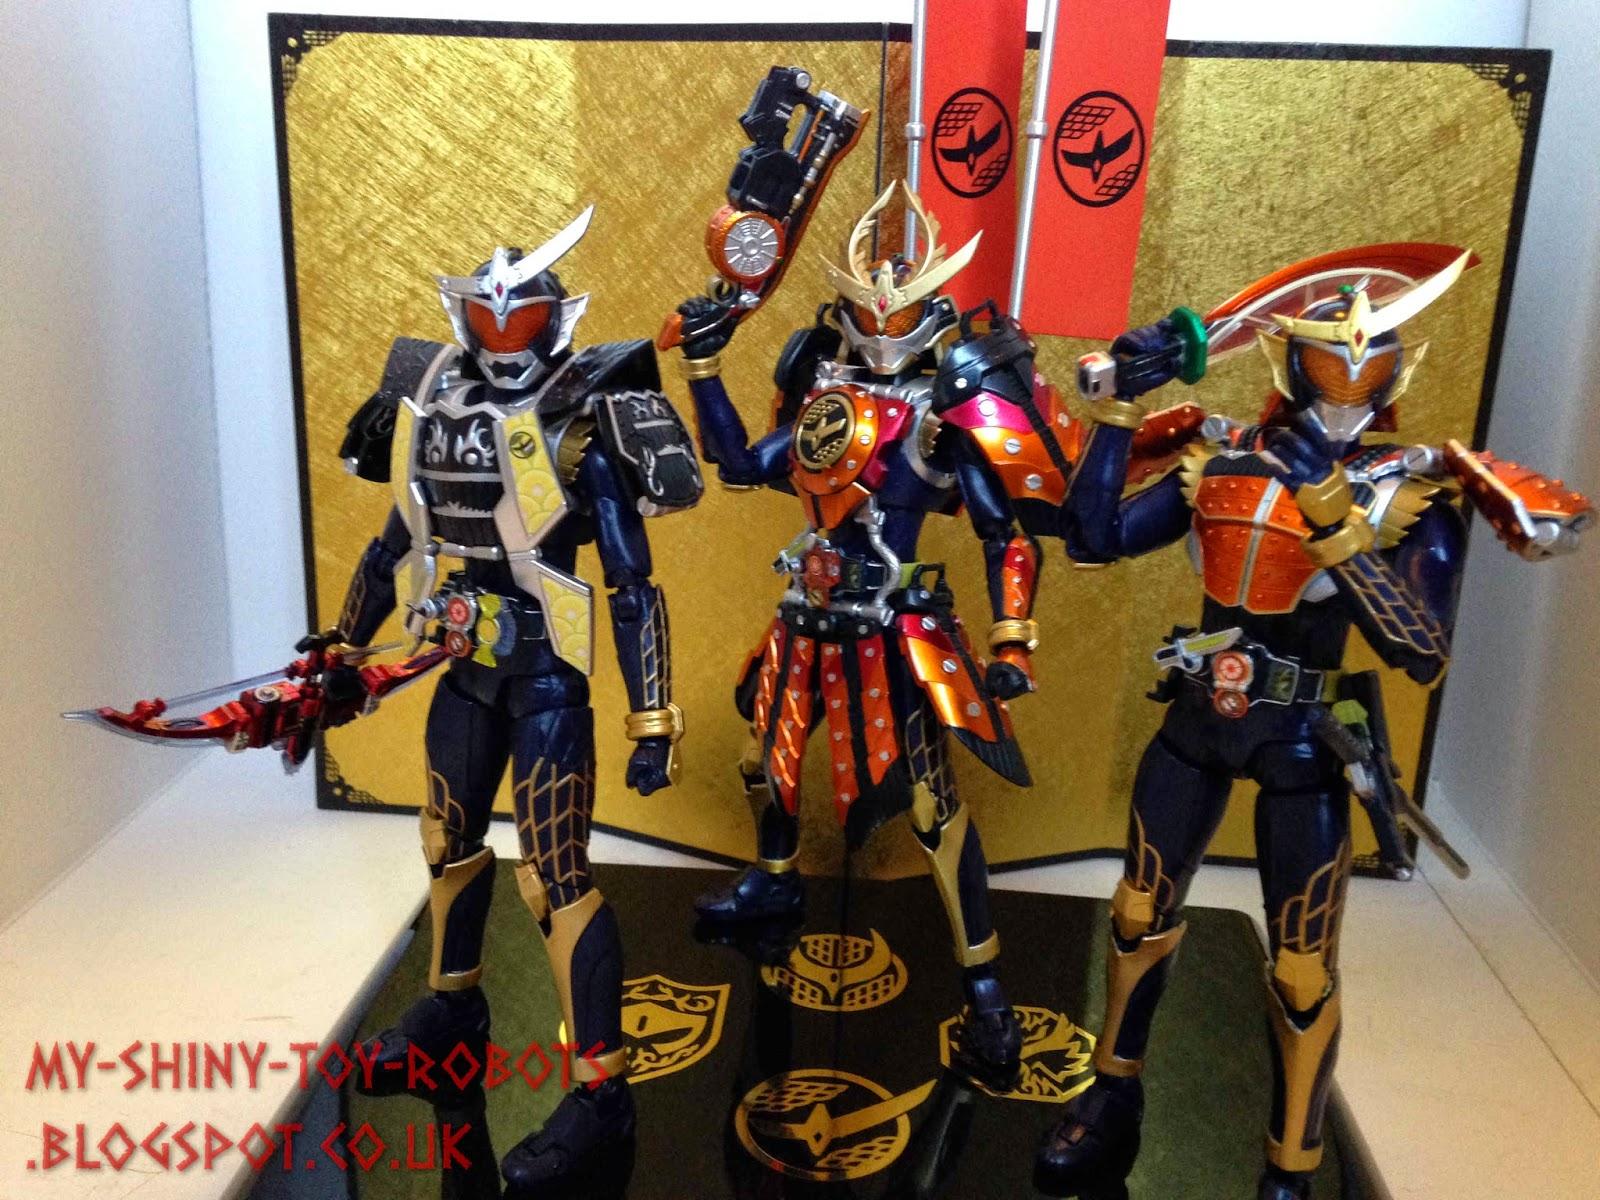 The forms of Kamen Rider Gaim